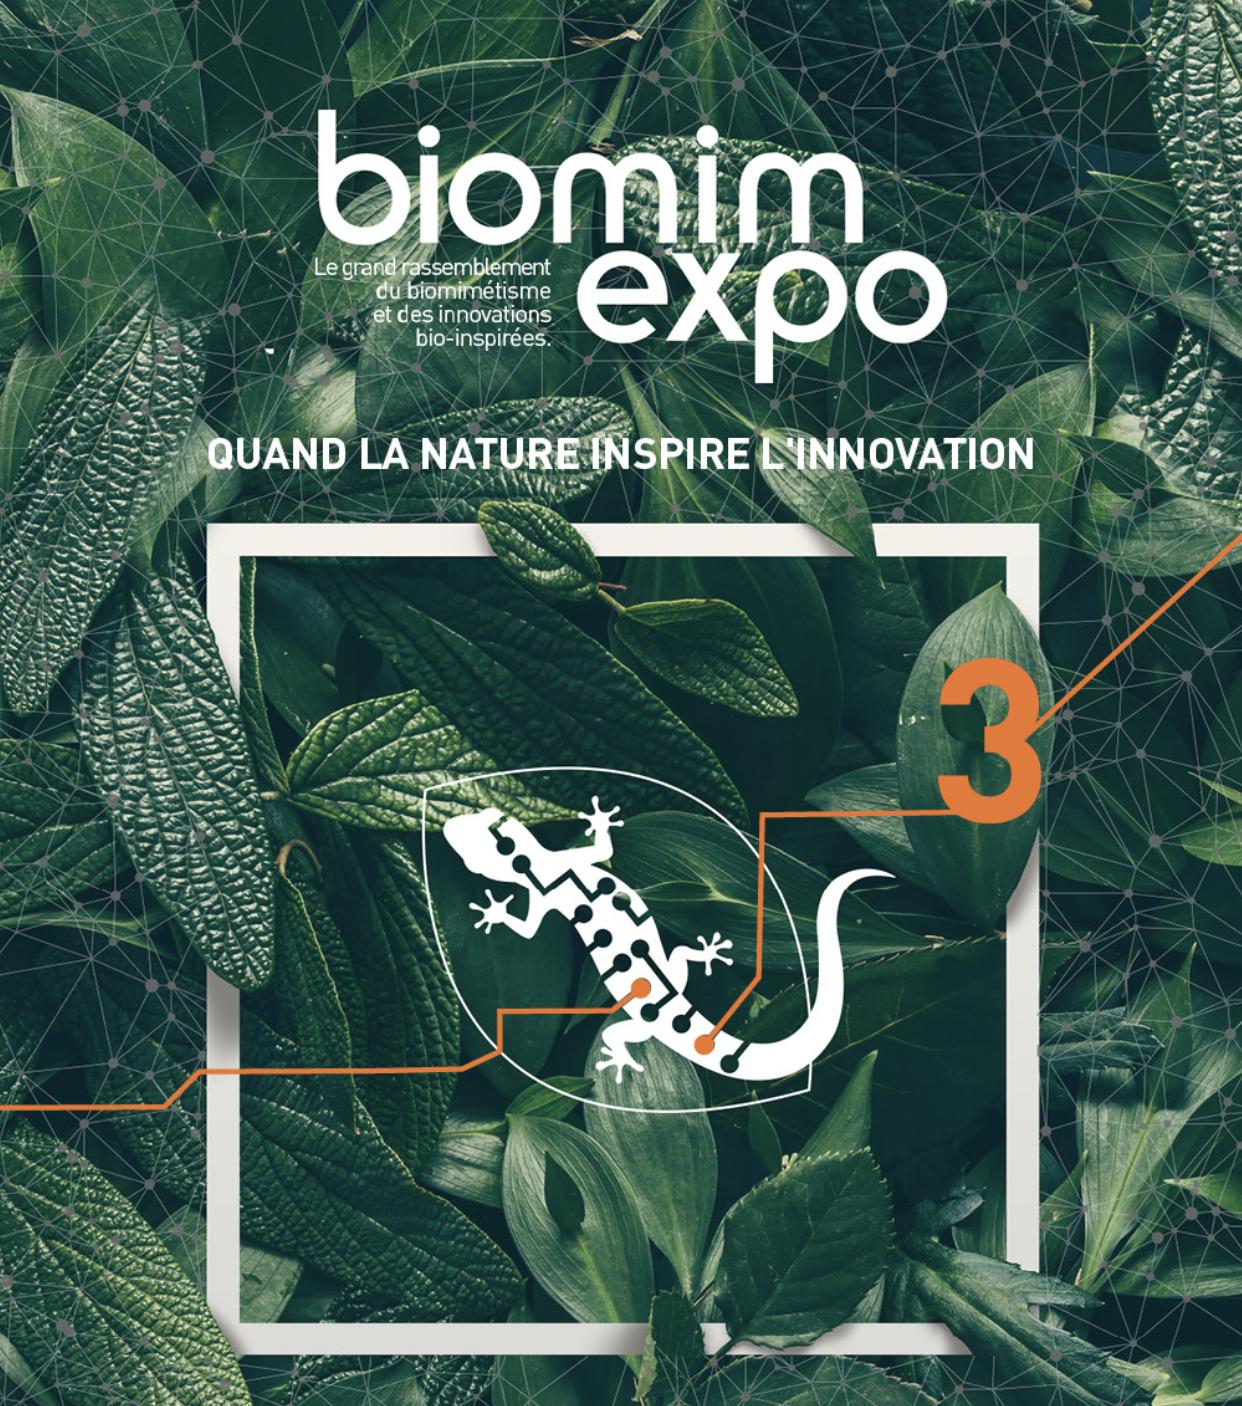 Biomim'expo     Paris, France - Oct 23, 2018